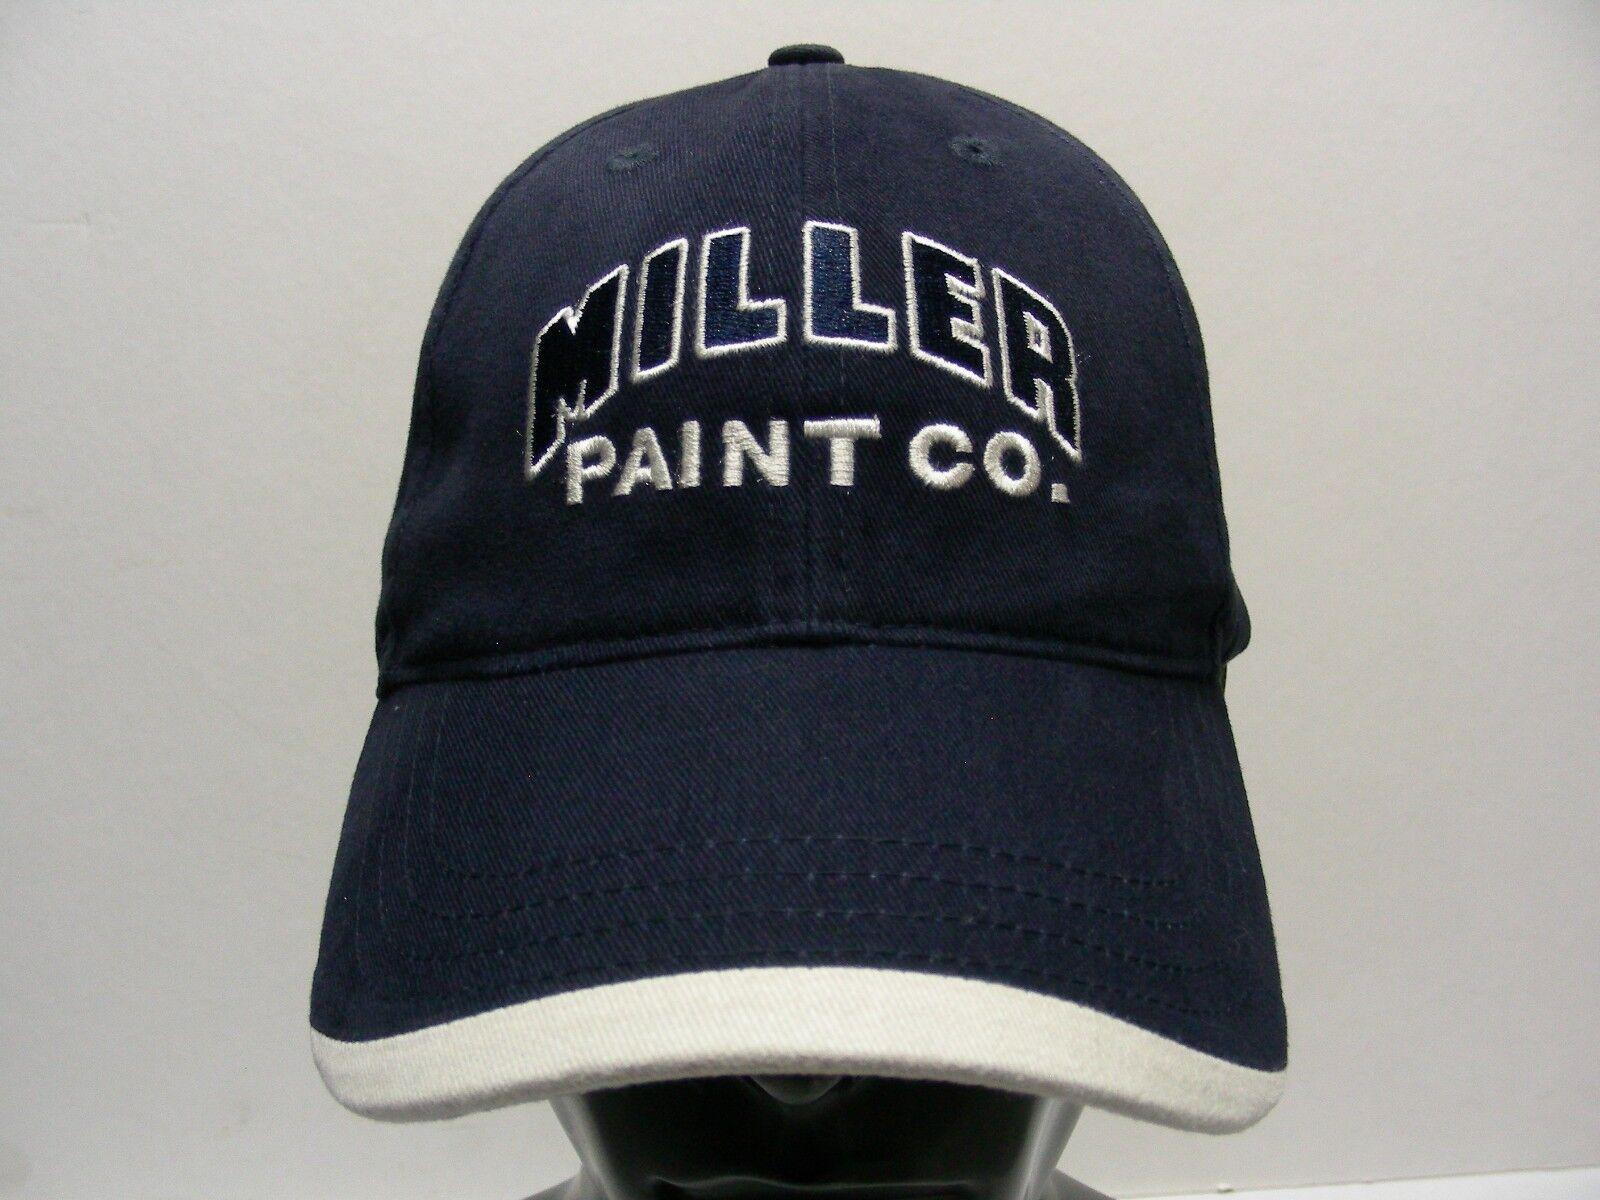 MILLER PAINT CO. - NAVY BALL BLUE - ADJUSTABLE STRAPBACK BALL NAVY CAP HAT ac51ec